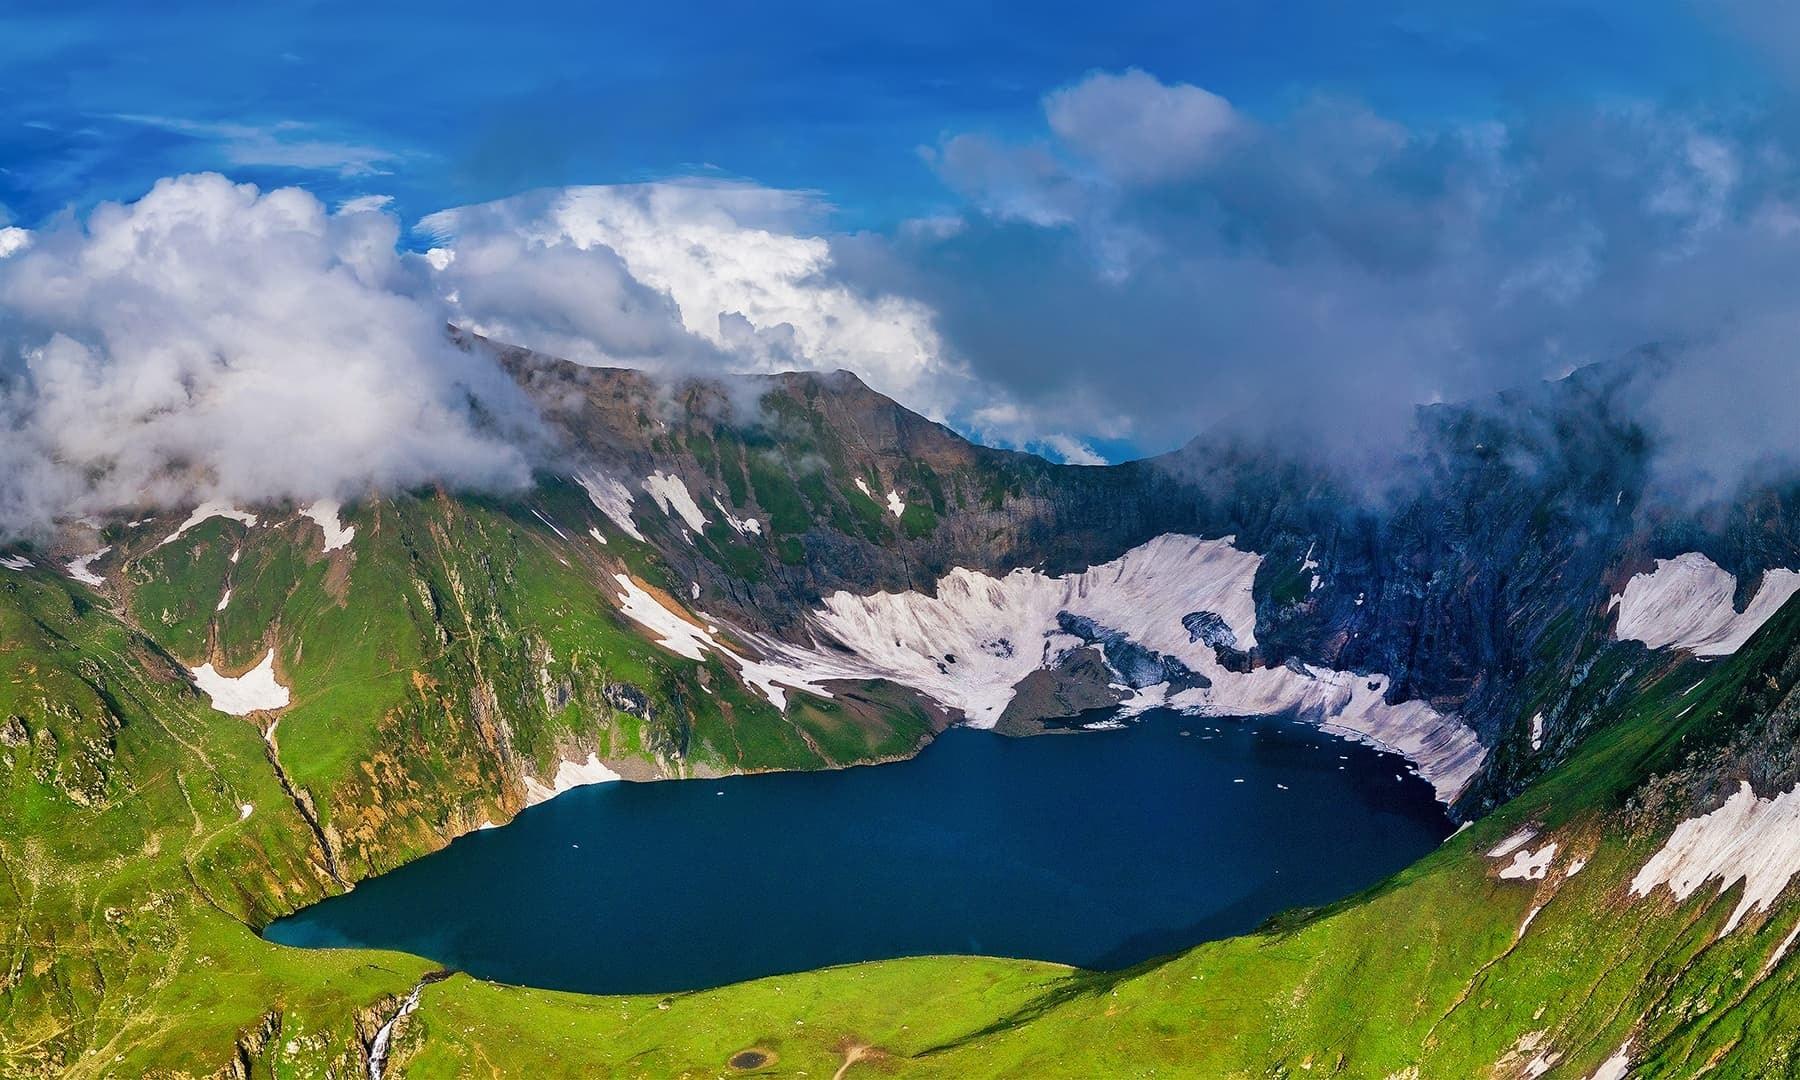 Aerial view of Rattigali Lake. — Photo by Syed Mehdi Bukhari